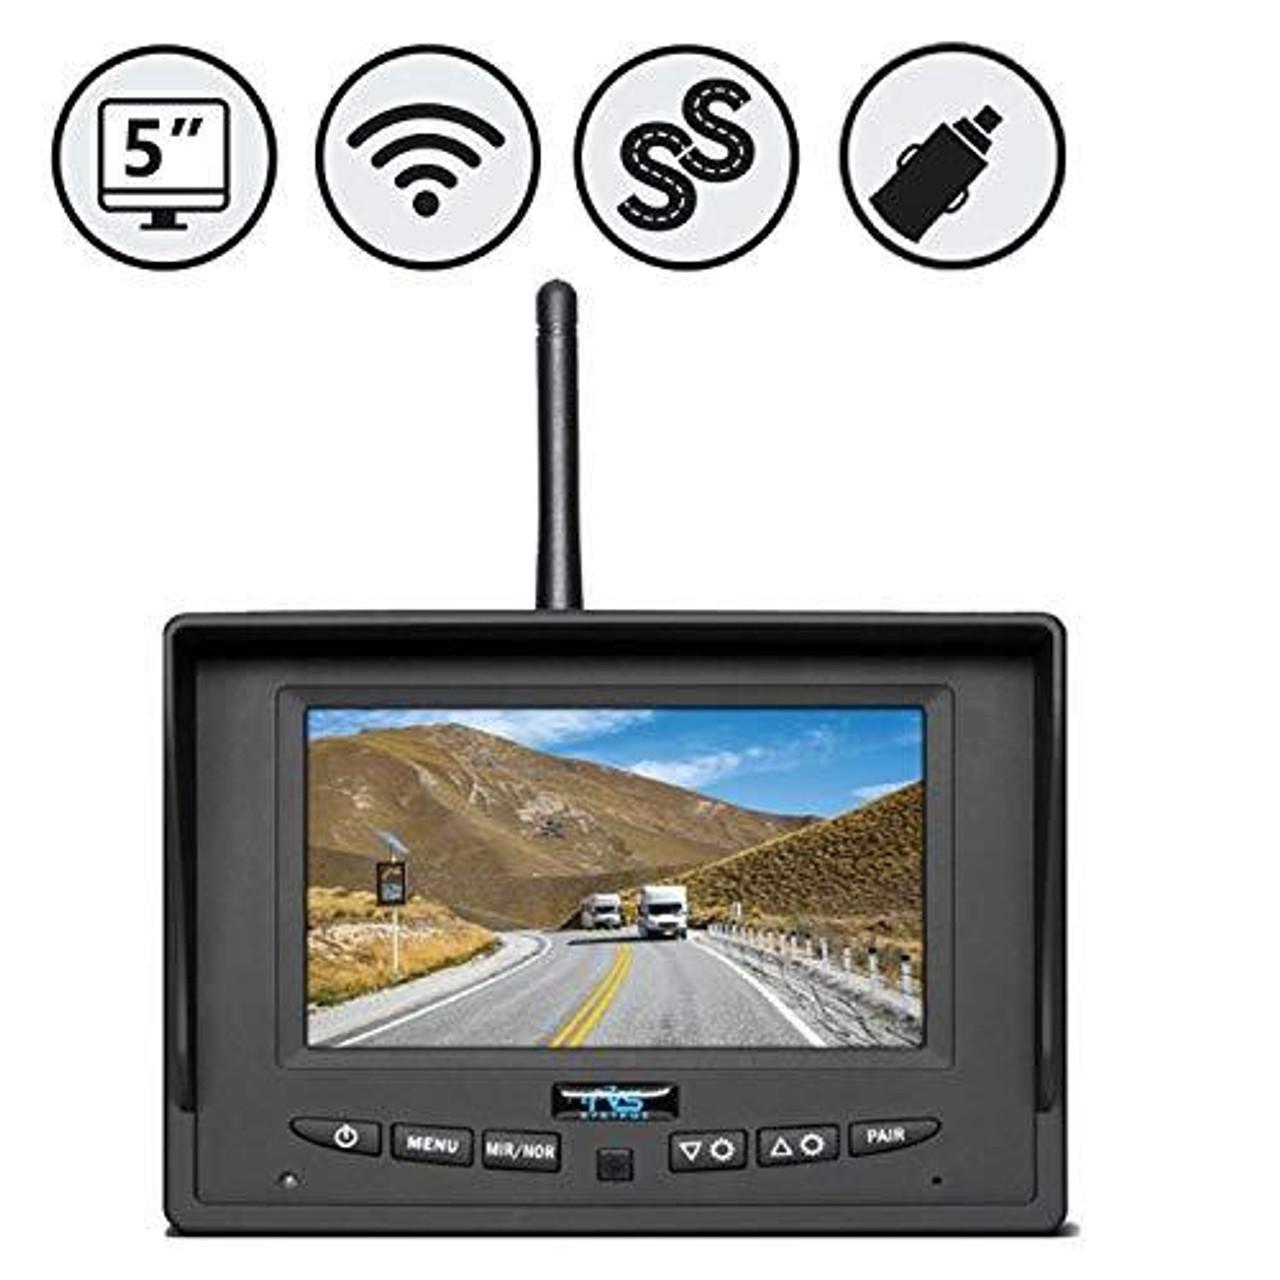 "Simplesight™ Wireless 5"" Led Single Screen Monitor"